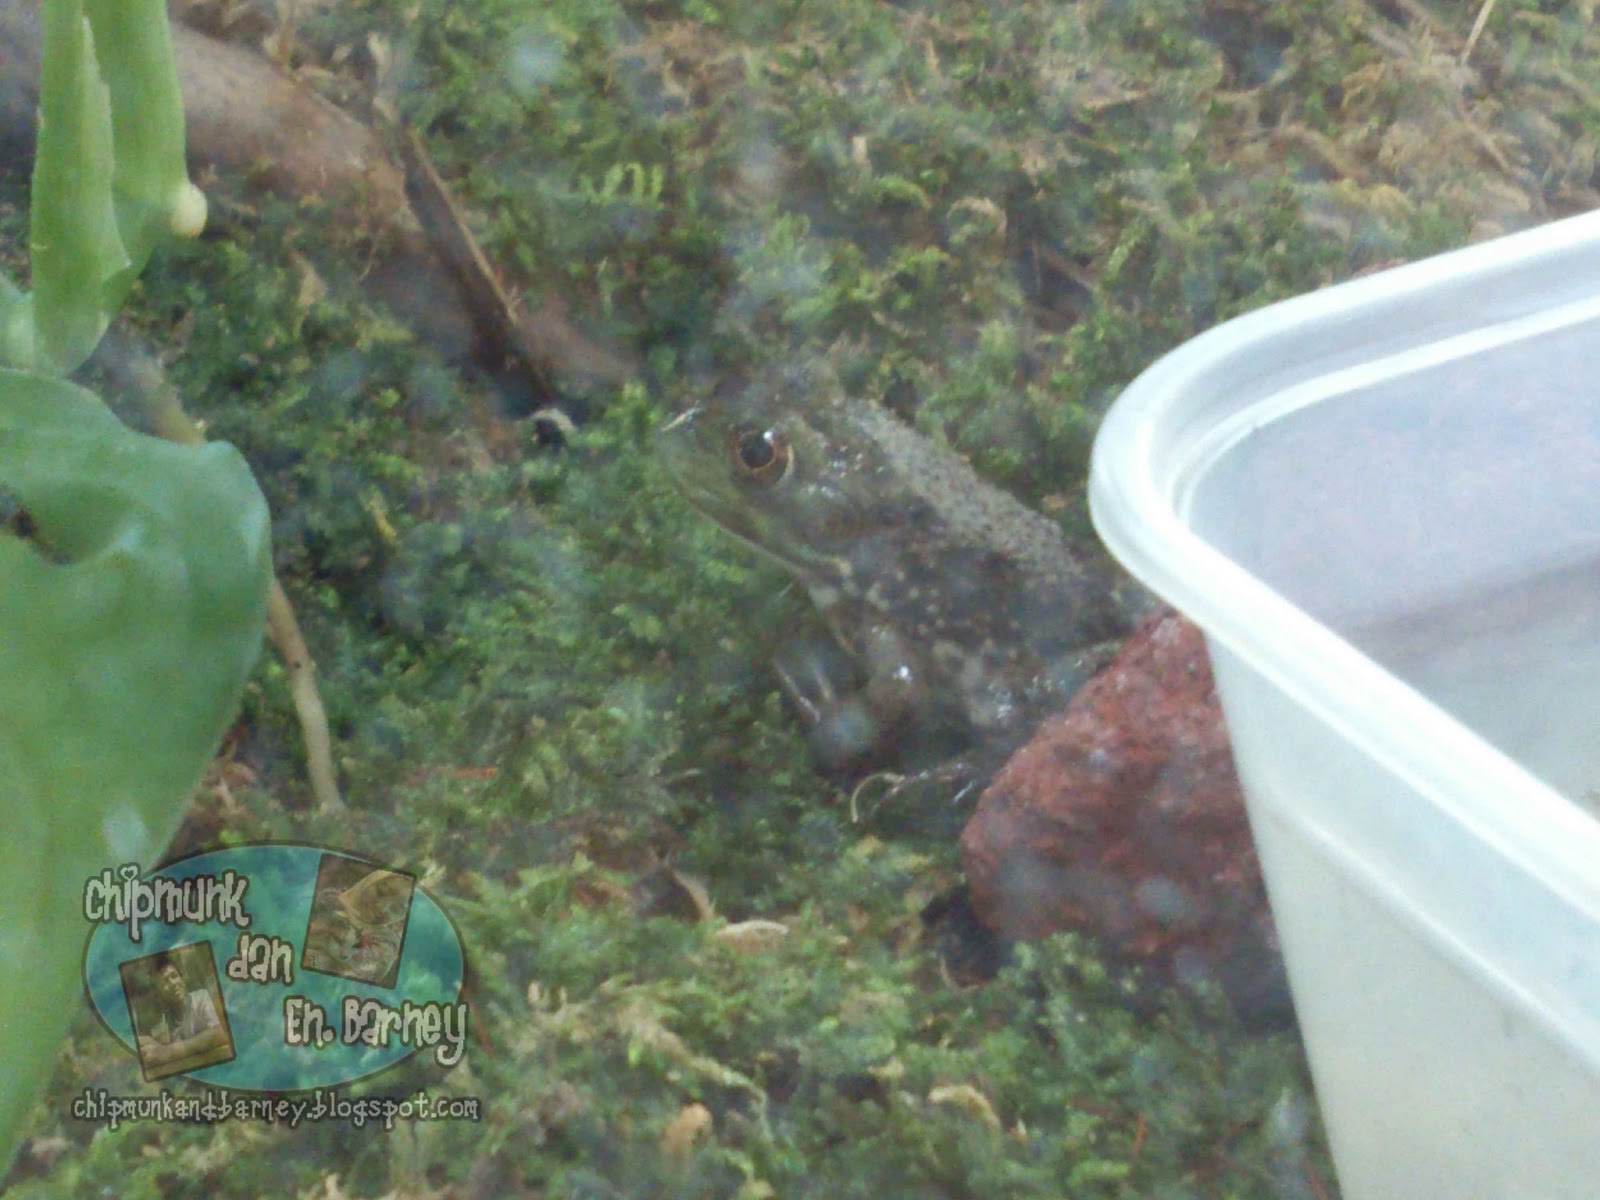 gambar katak - gambar katak comel